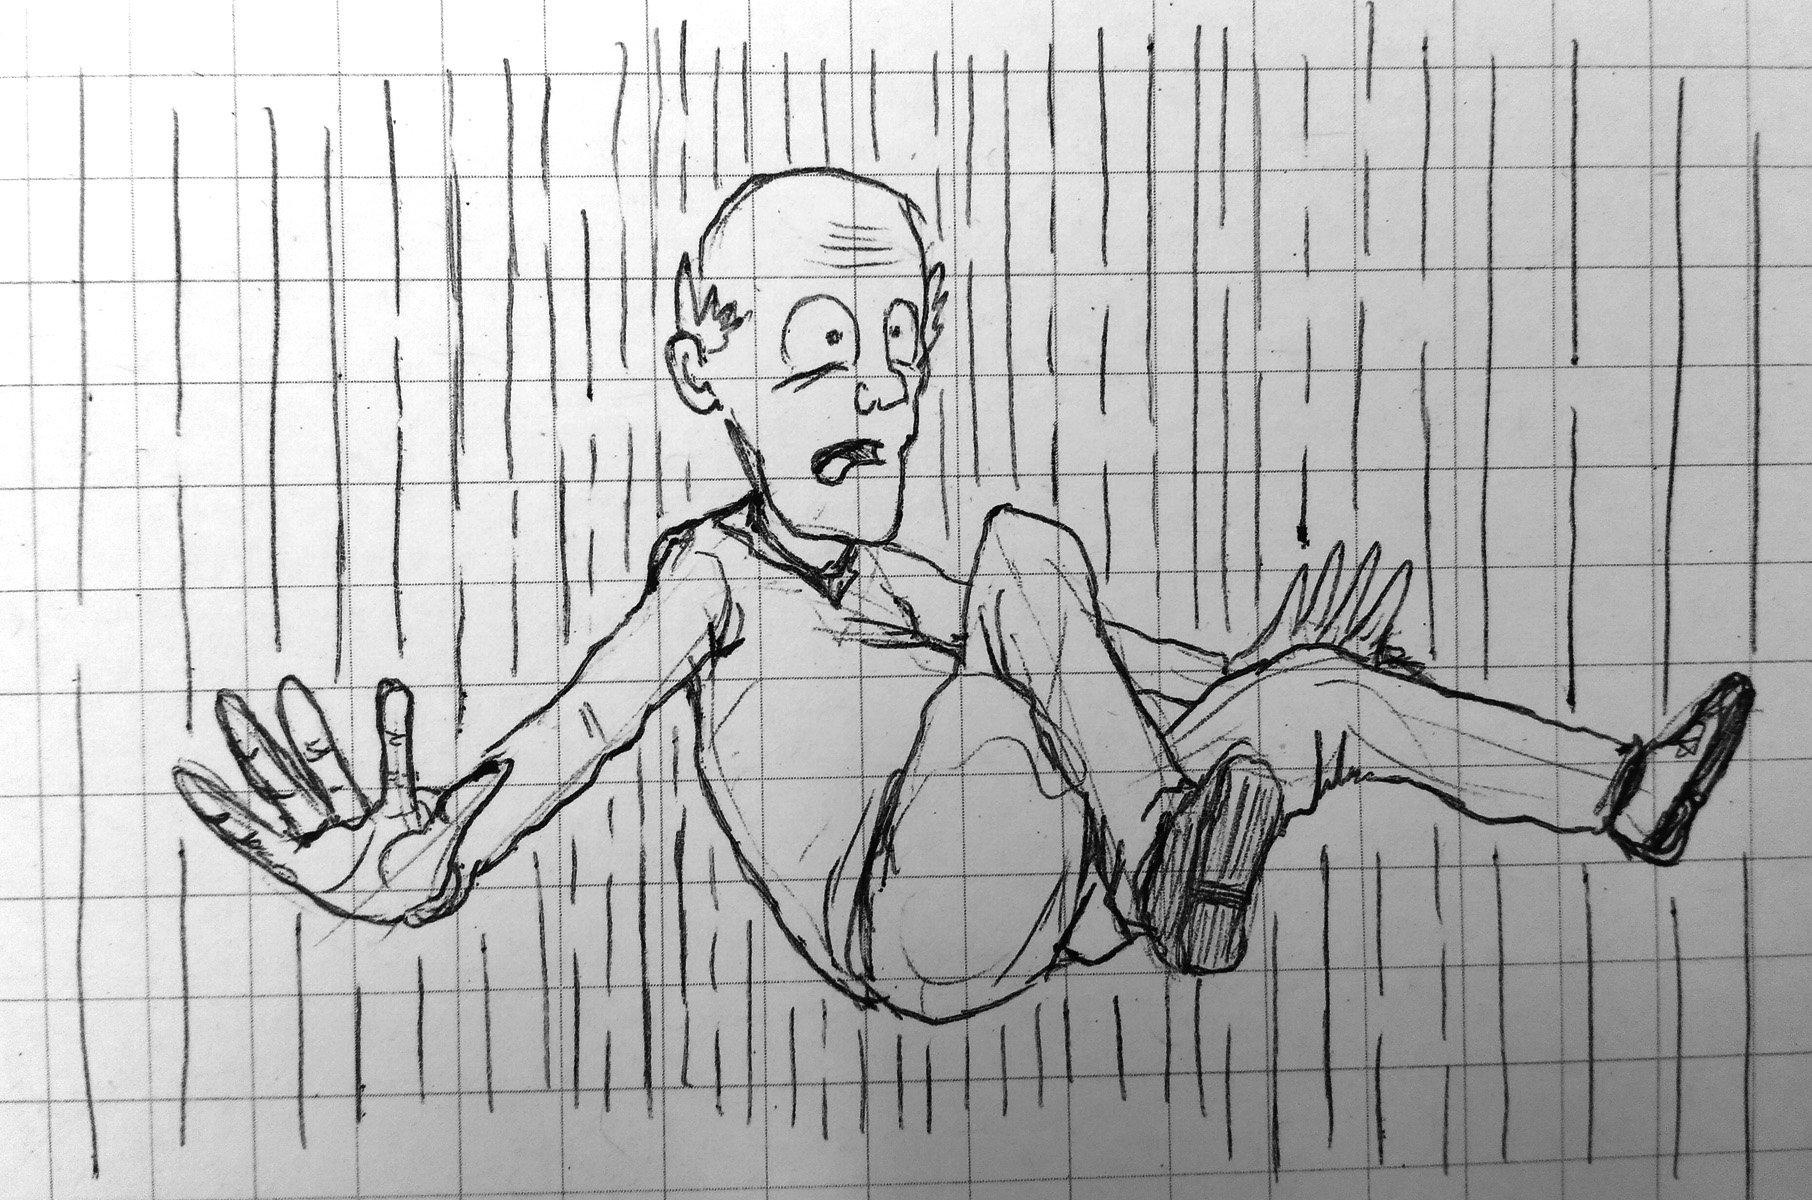 falling_guy_scribble.jpg.619056c38de66c1c55c6afd4d20b3424.jpg